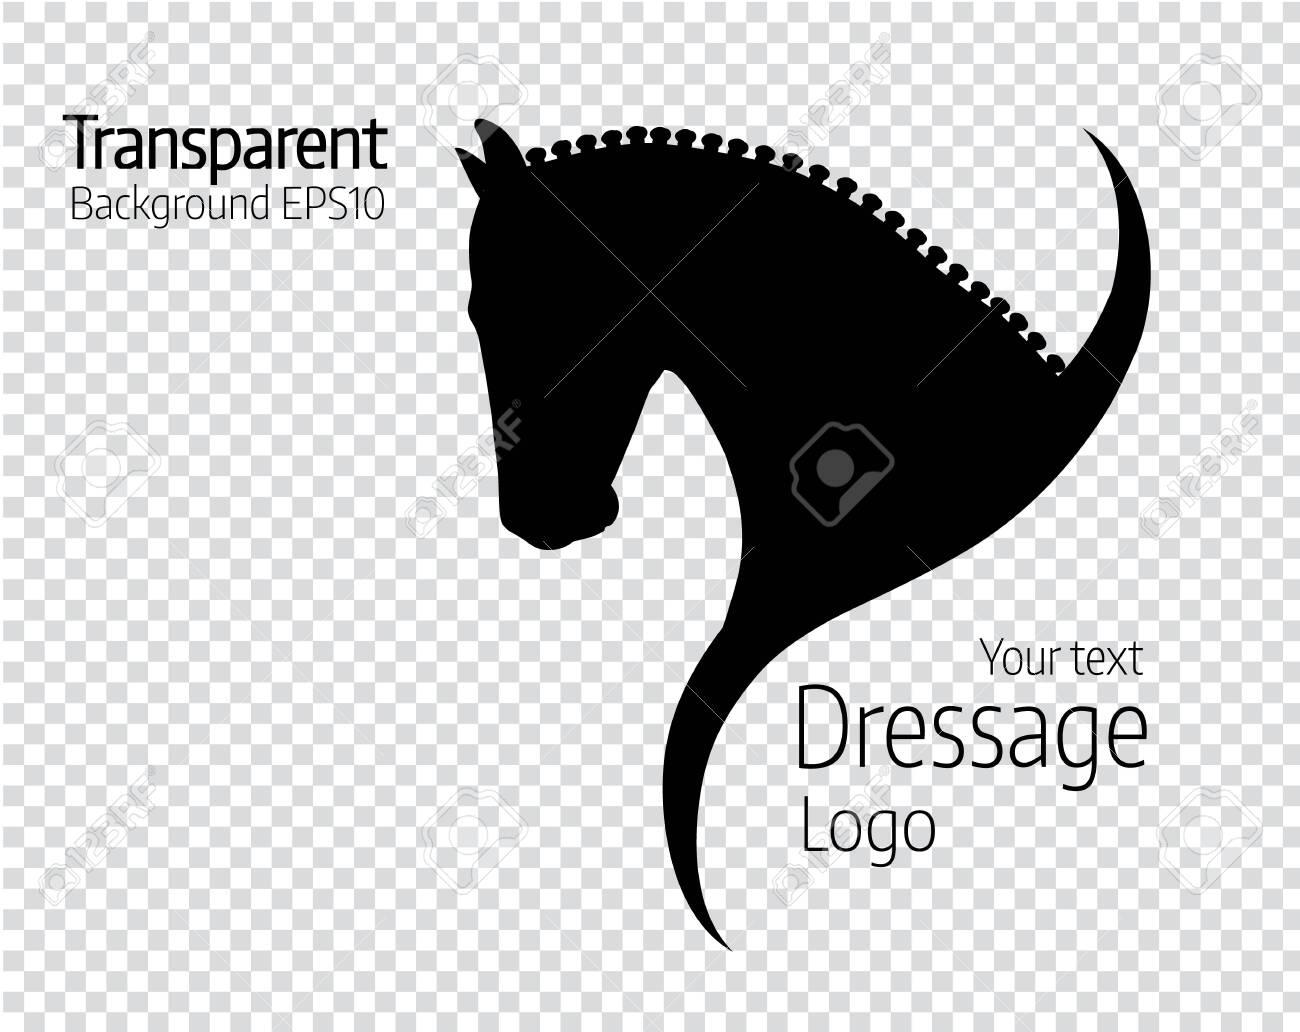 Transparent hand drawn black vector horse logo silhouette. - 148862103